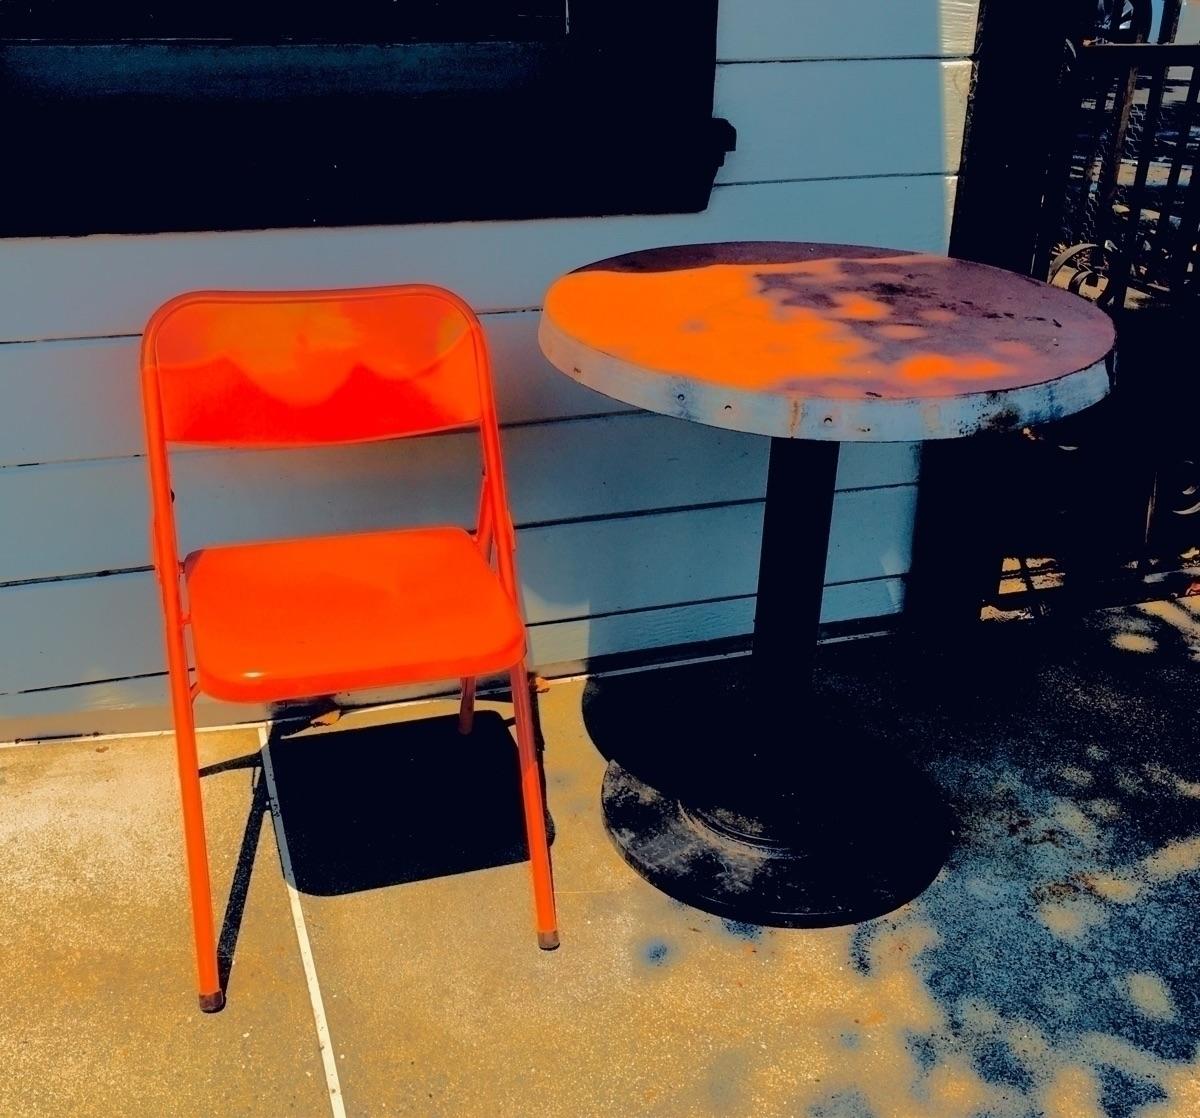 orangechair, iphone - katemoriarty | ello